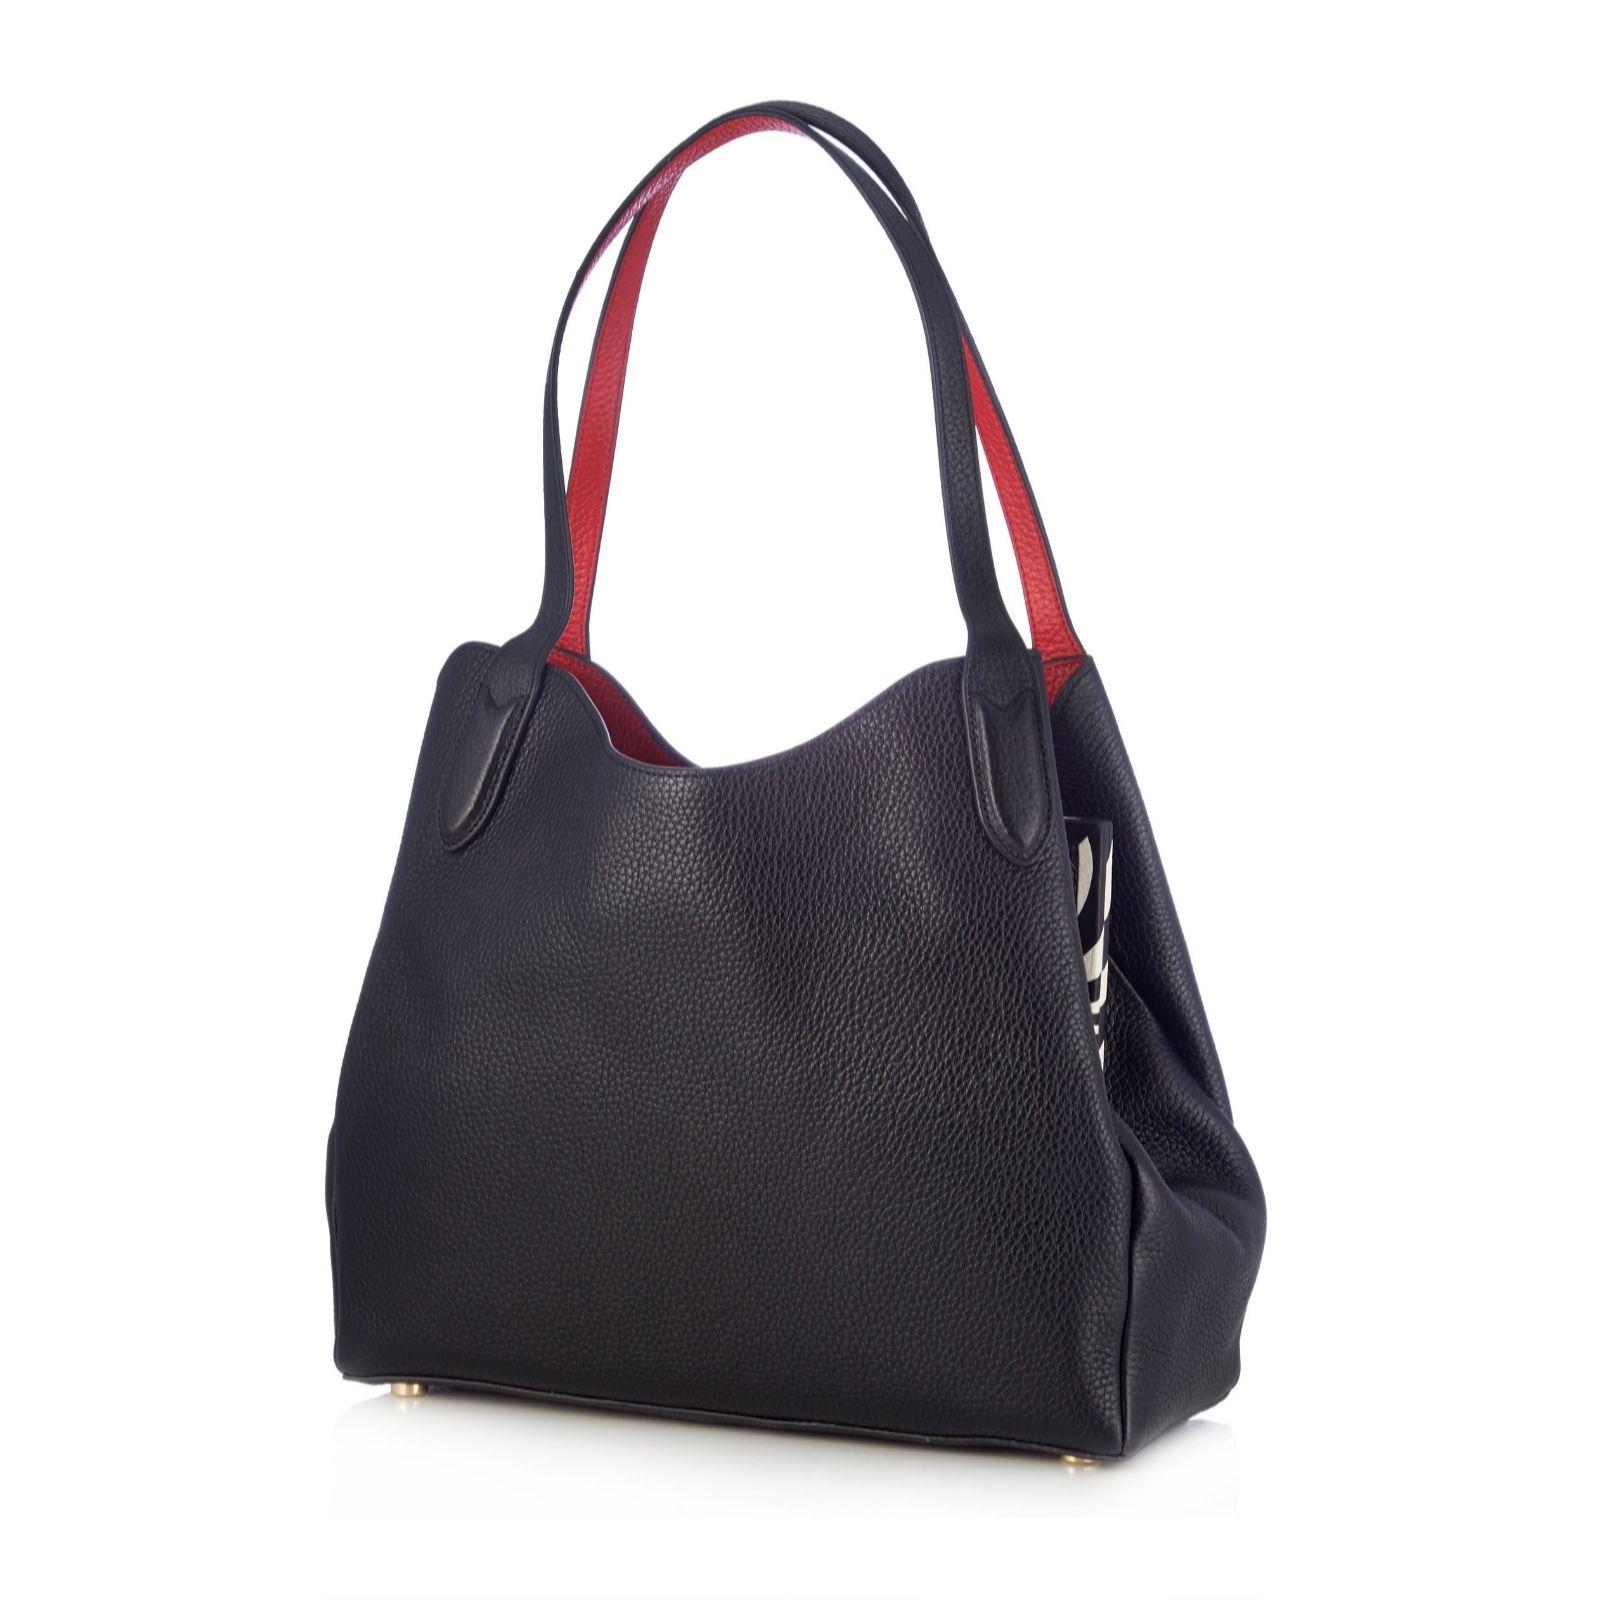 8ebbaadc1706b Lulu Guinness Jackie Leather Shoulder Bag - QVC UK